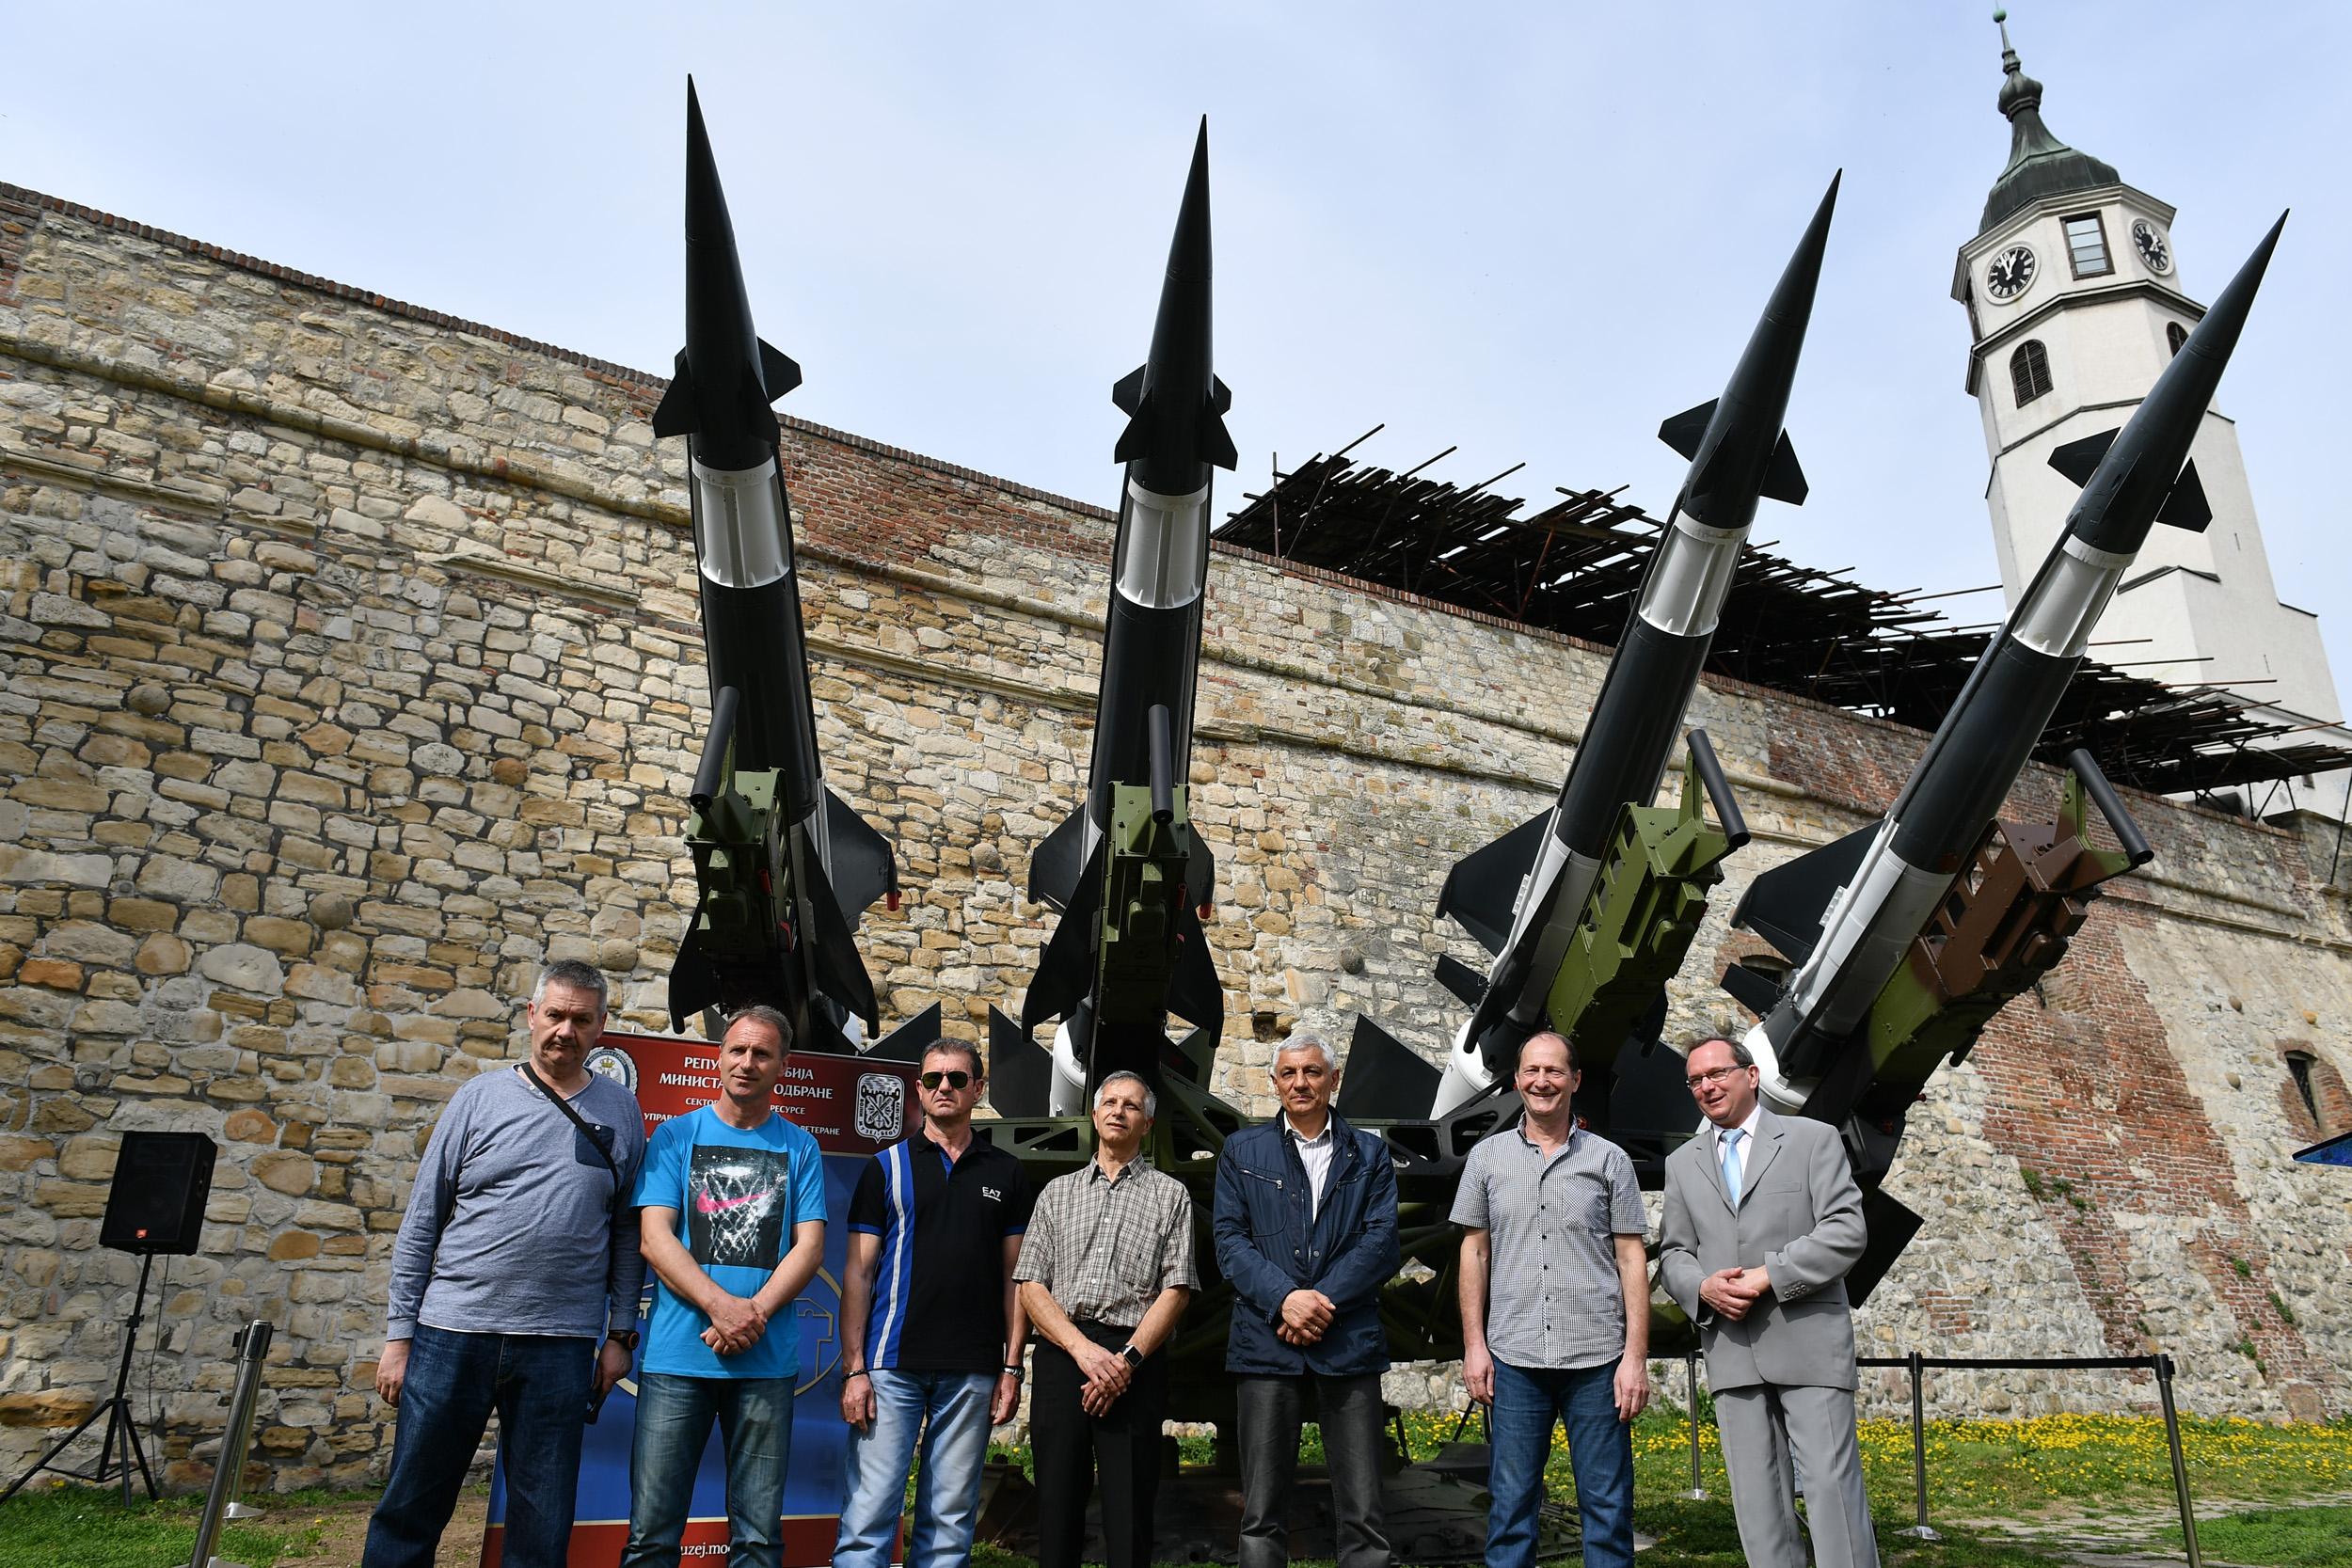 Beograd: Lansirna rampa i rakete NEVA za Dan sećanja